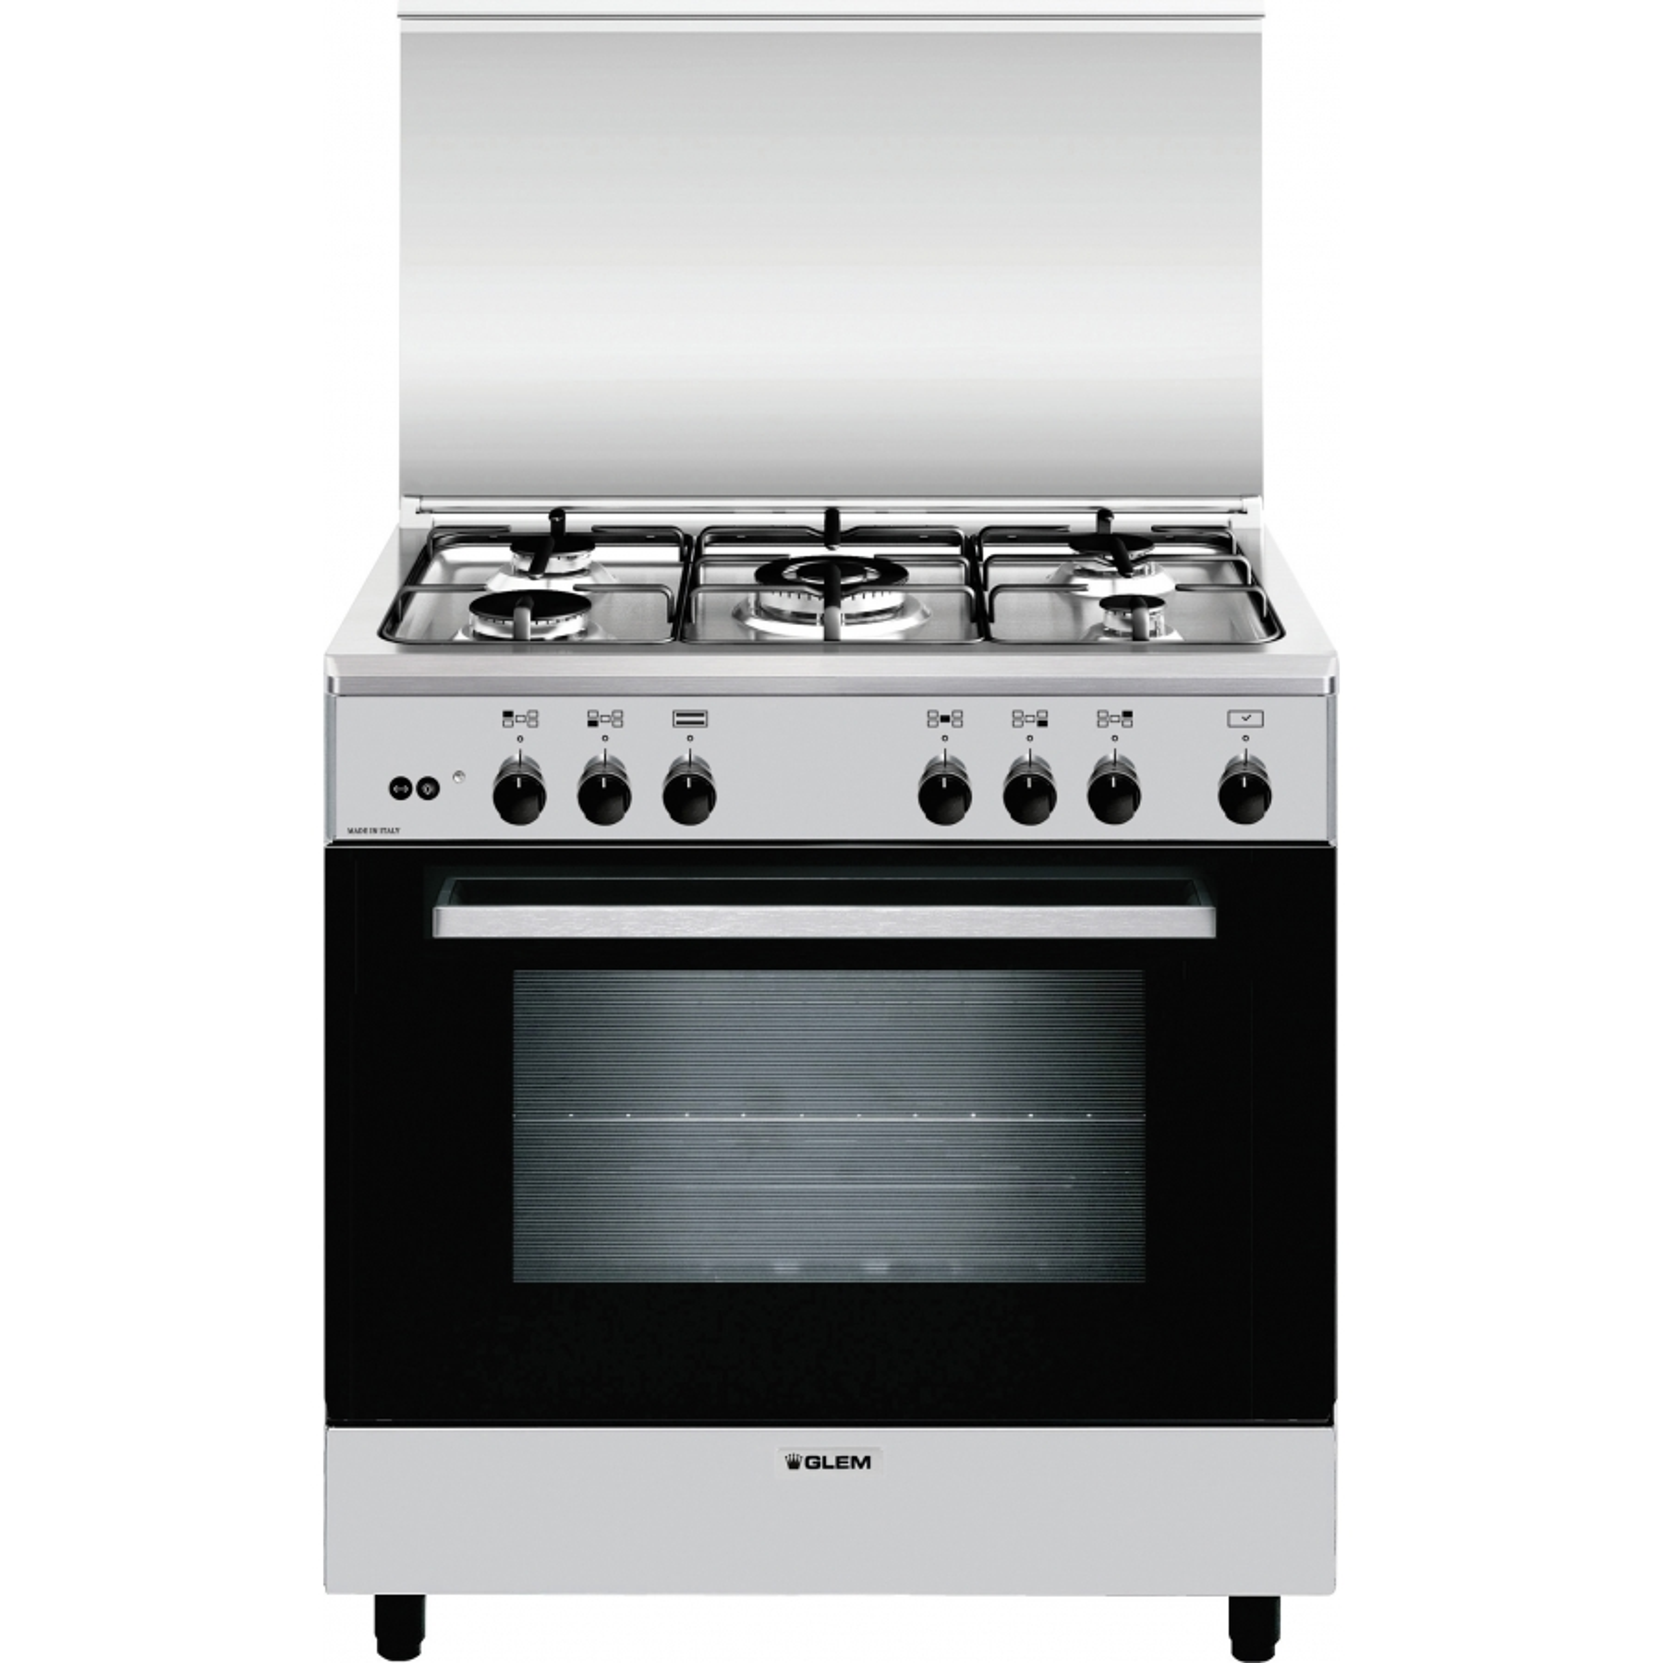 Glem a855gi cucina 5 fuochi a gas 80x50cm forno a gas inox - Eprice cucine a gas ...